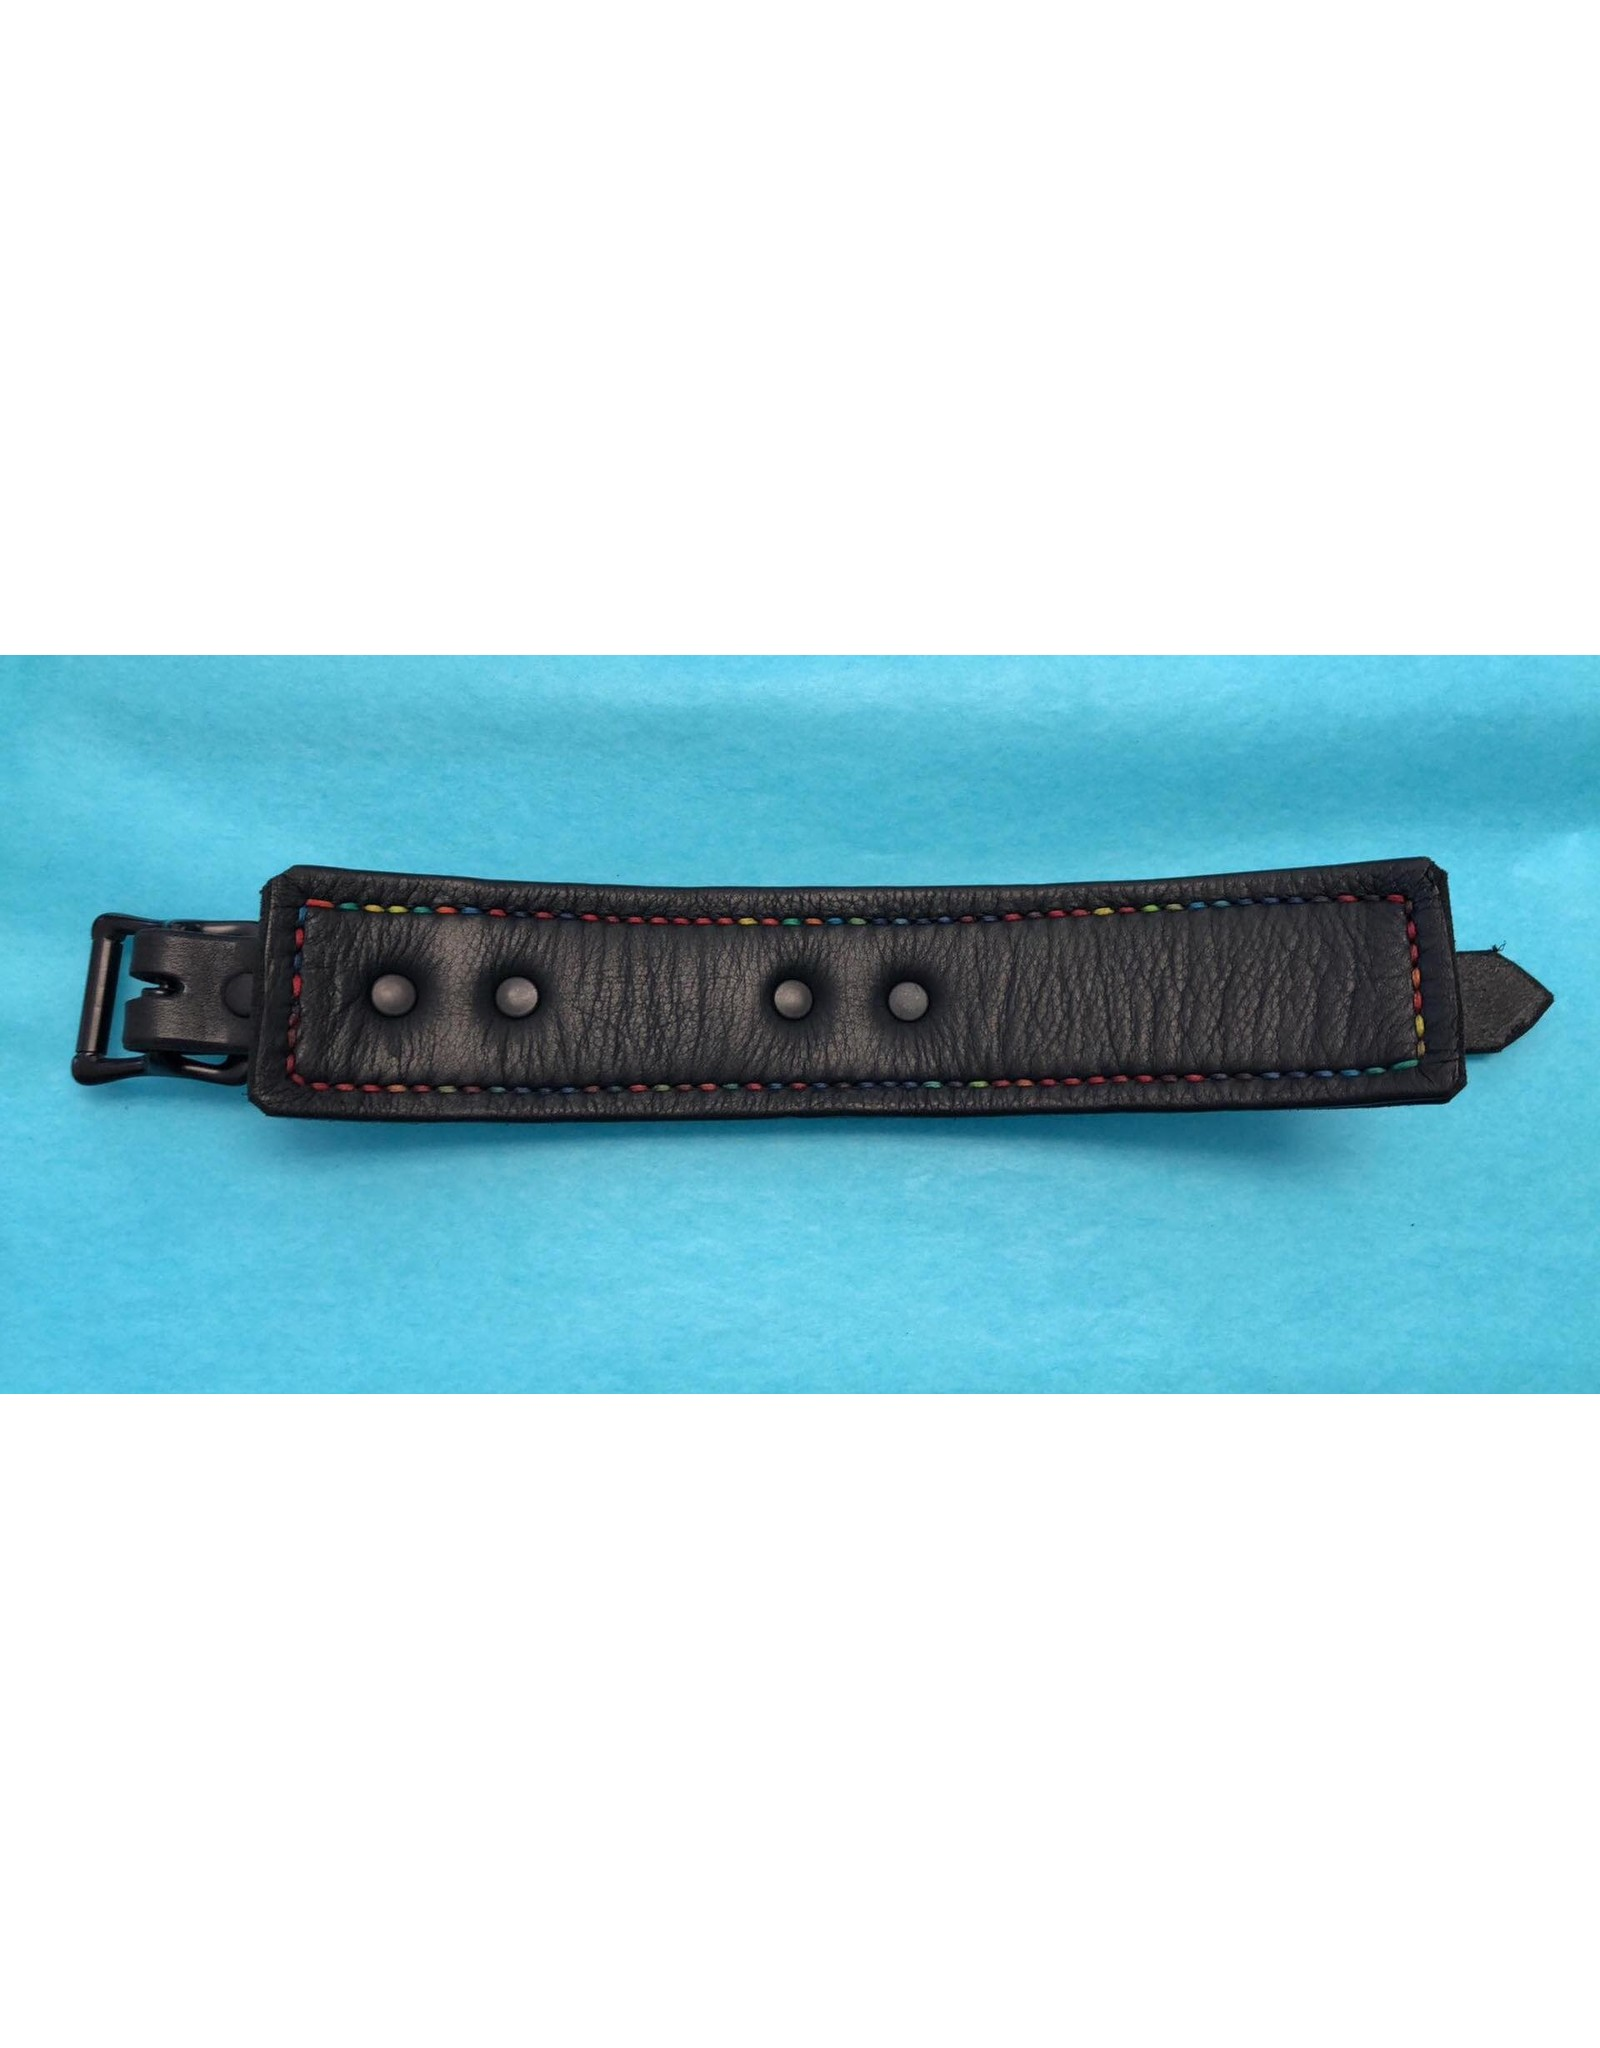 The Leather Union Wrist Restraint Set